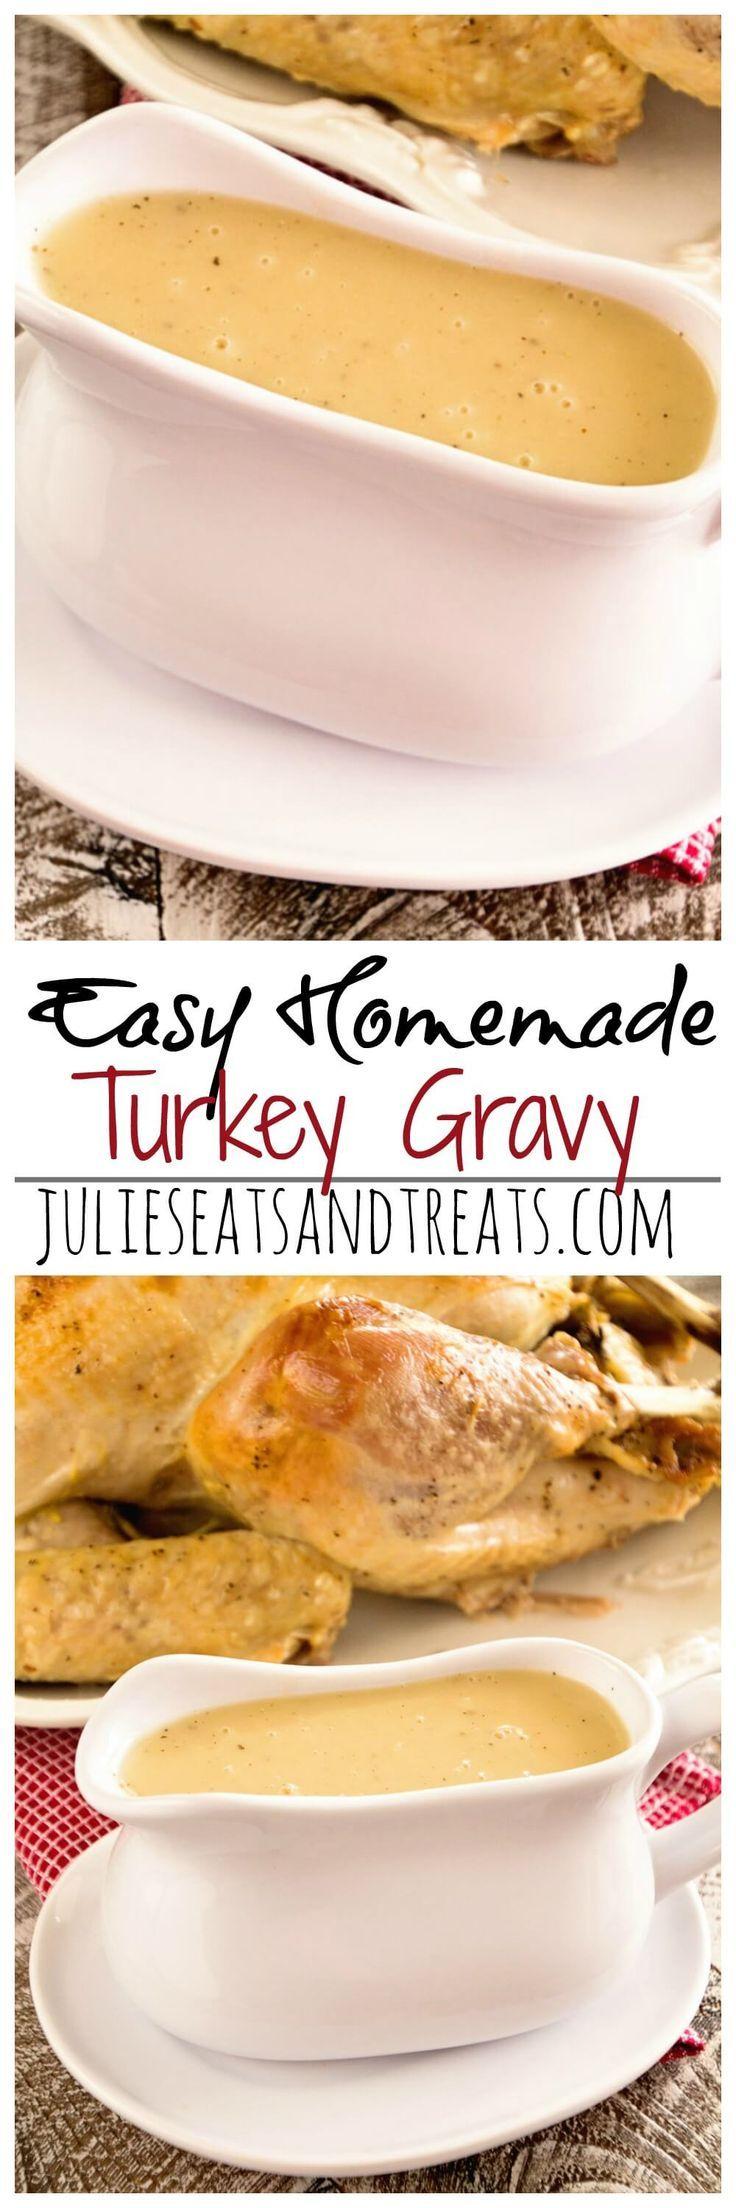 Easy Homemade Gravy Recipe ~ Delicious Homemade Turkey Gravy that Anyone Can Make!